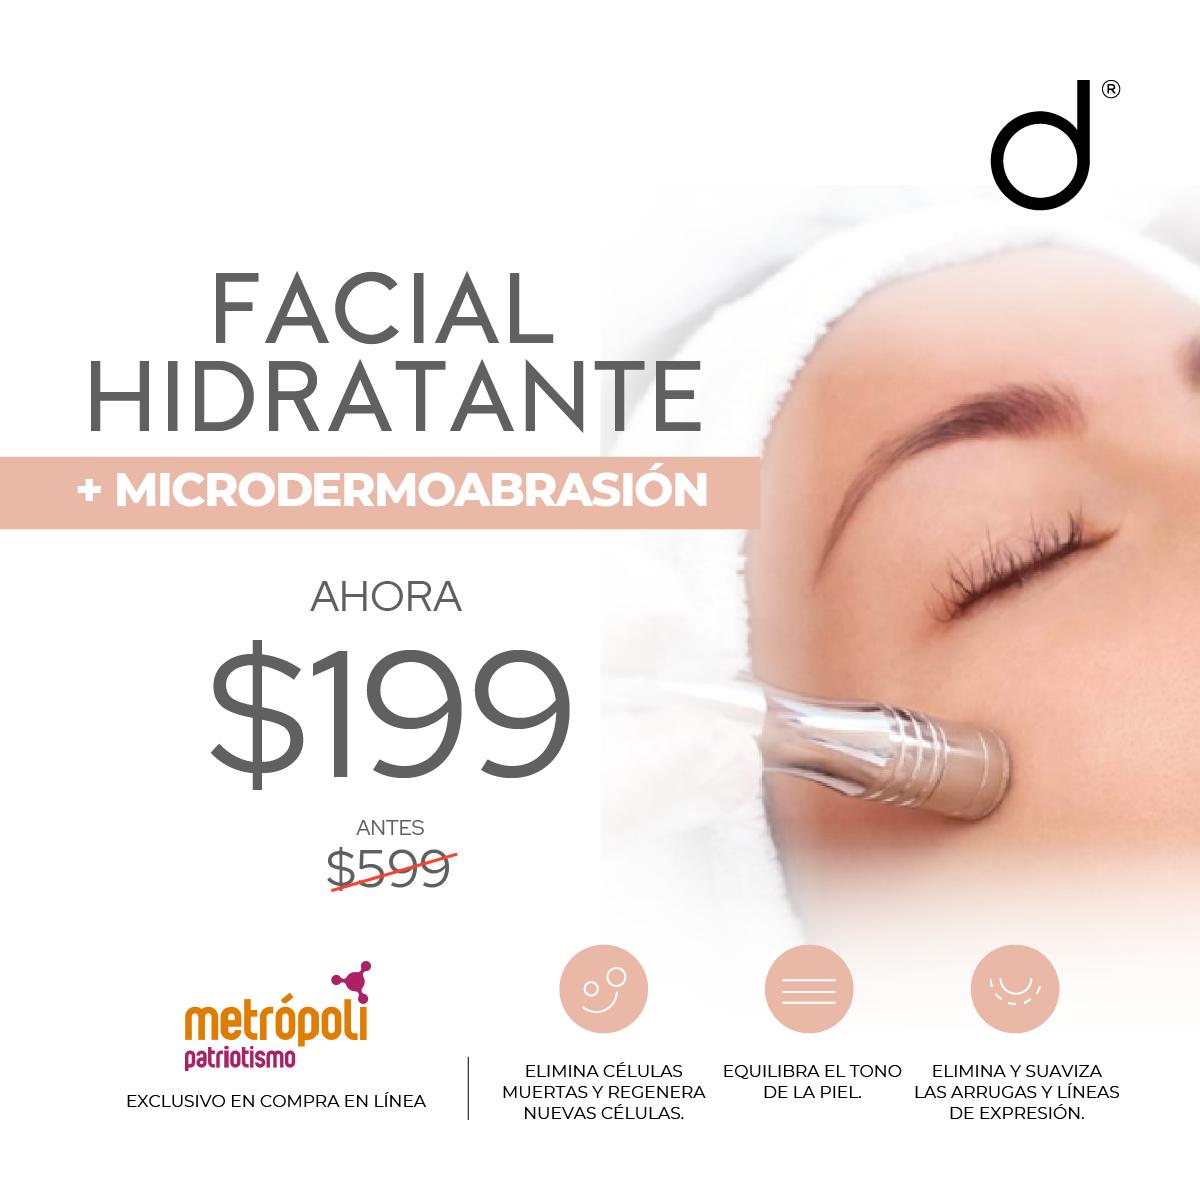 Facial Hidratante + Microdermoabrasión- SÓLO METRÓPOLI PATRIOTISMO&w=900&h=900&fit=crop